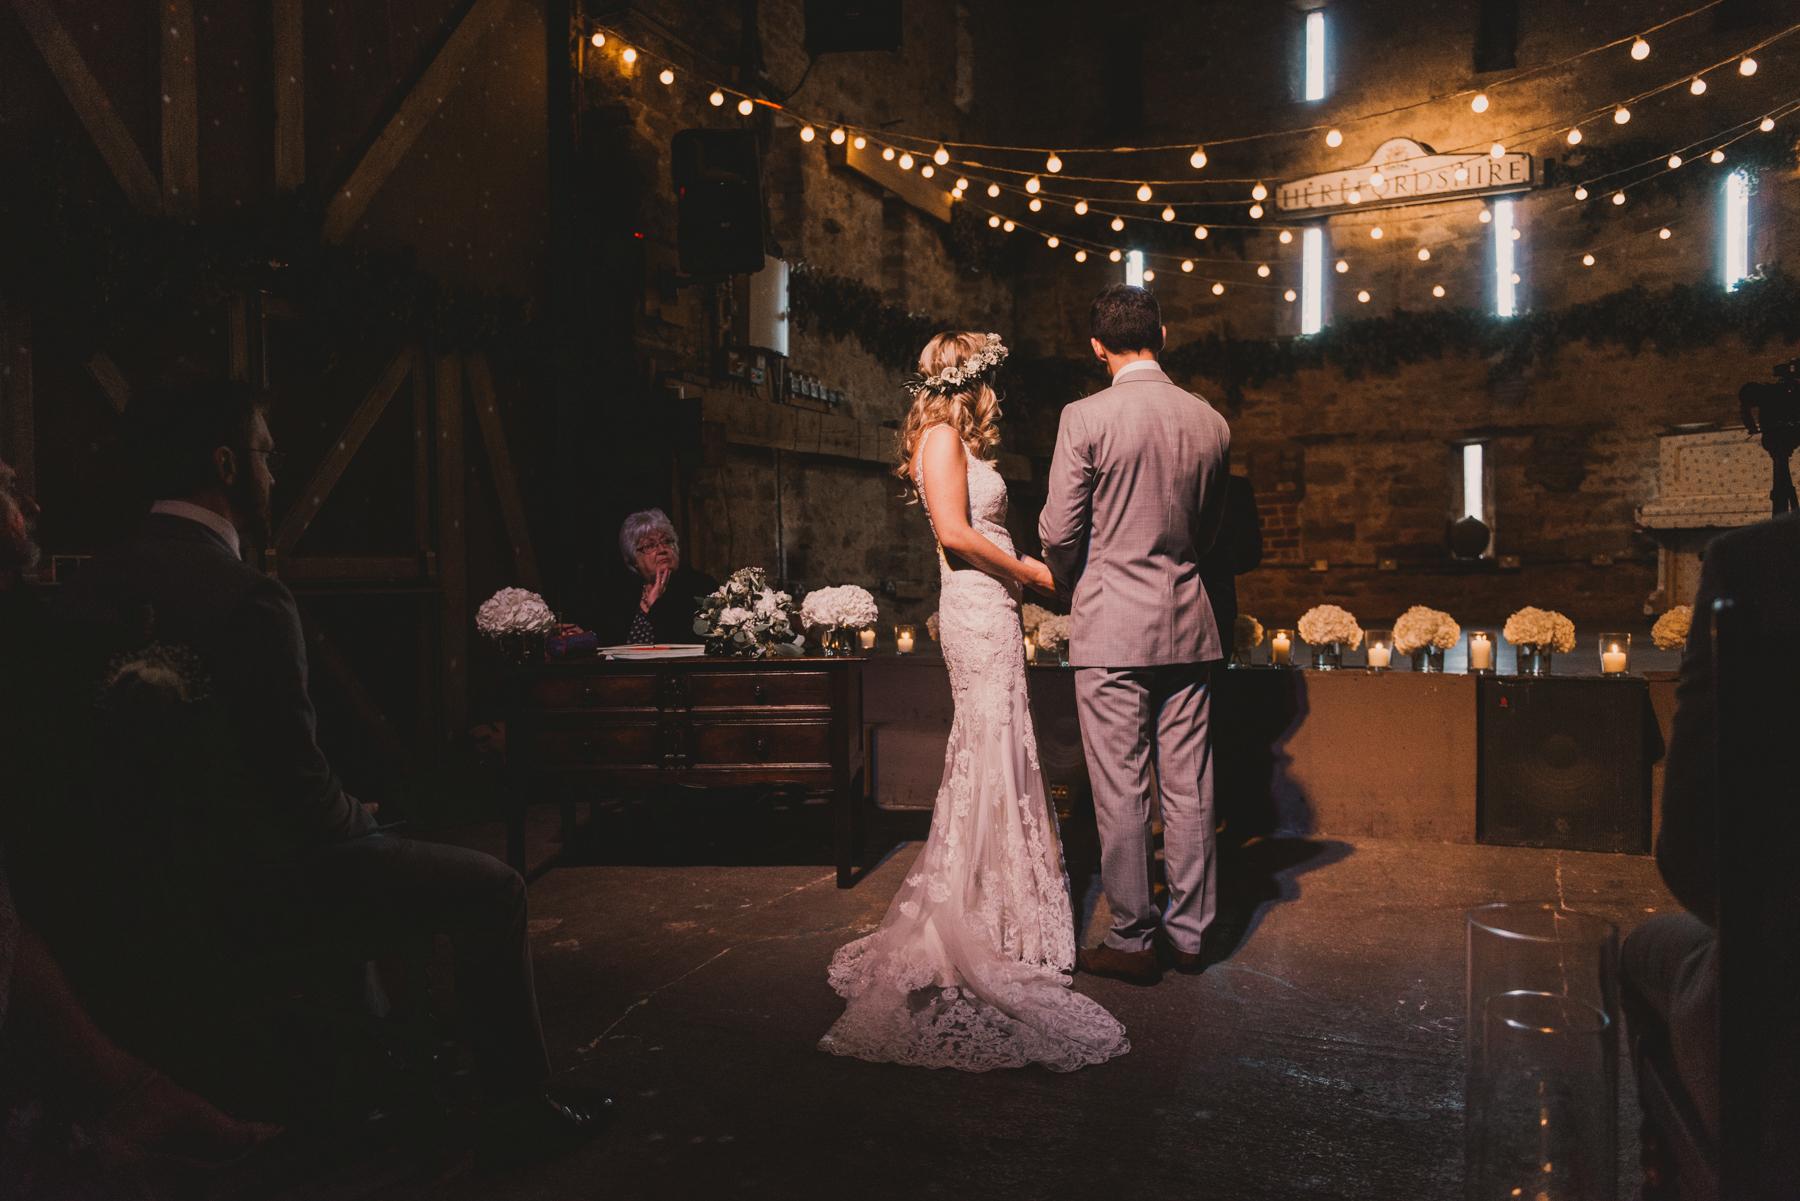 Herefordshire-barn-wedding-highlights-054.jpg